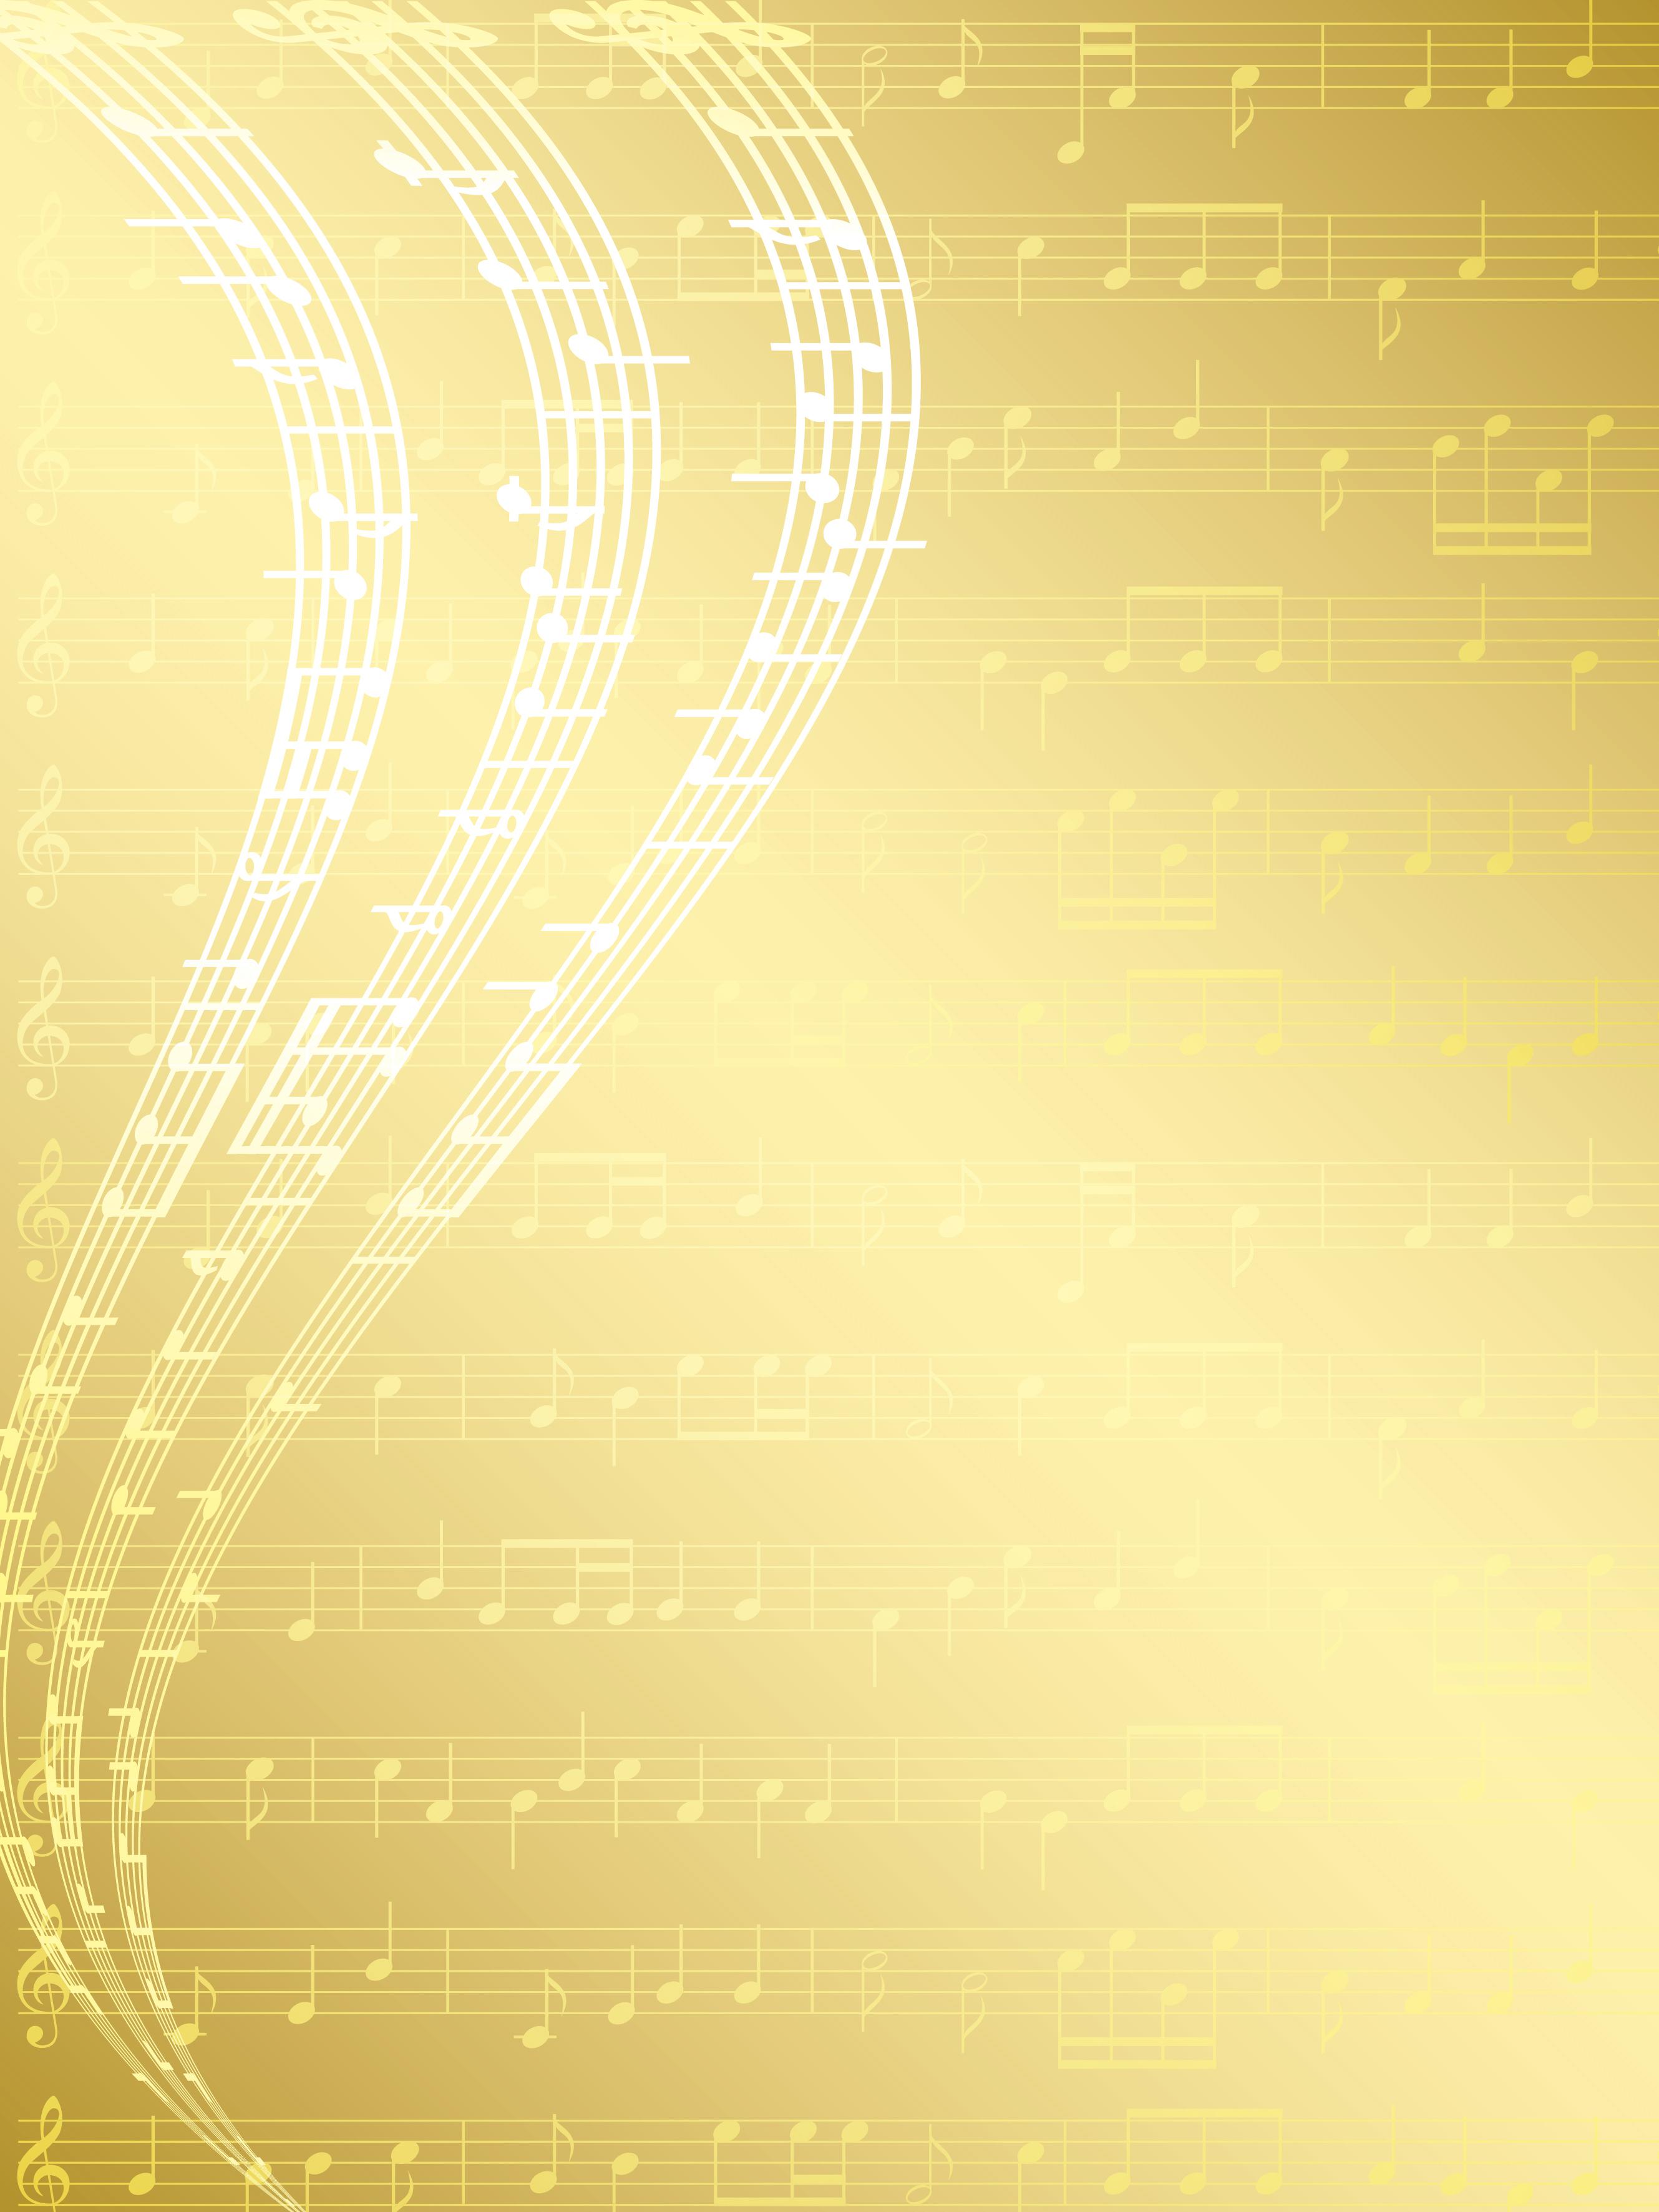 Schwob School of Music: Steven Tharp, tenor